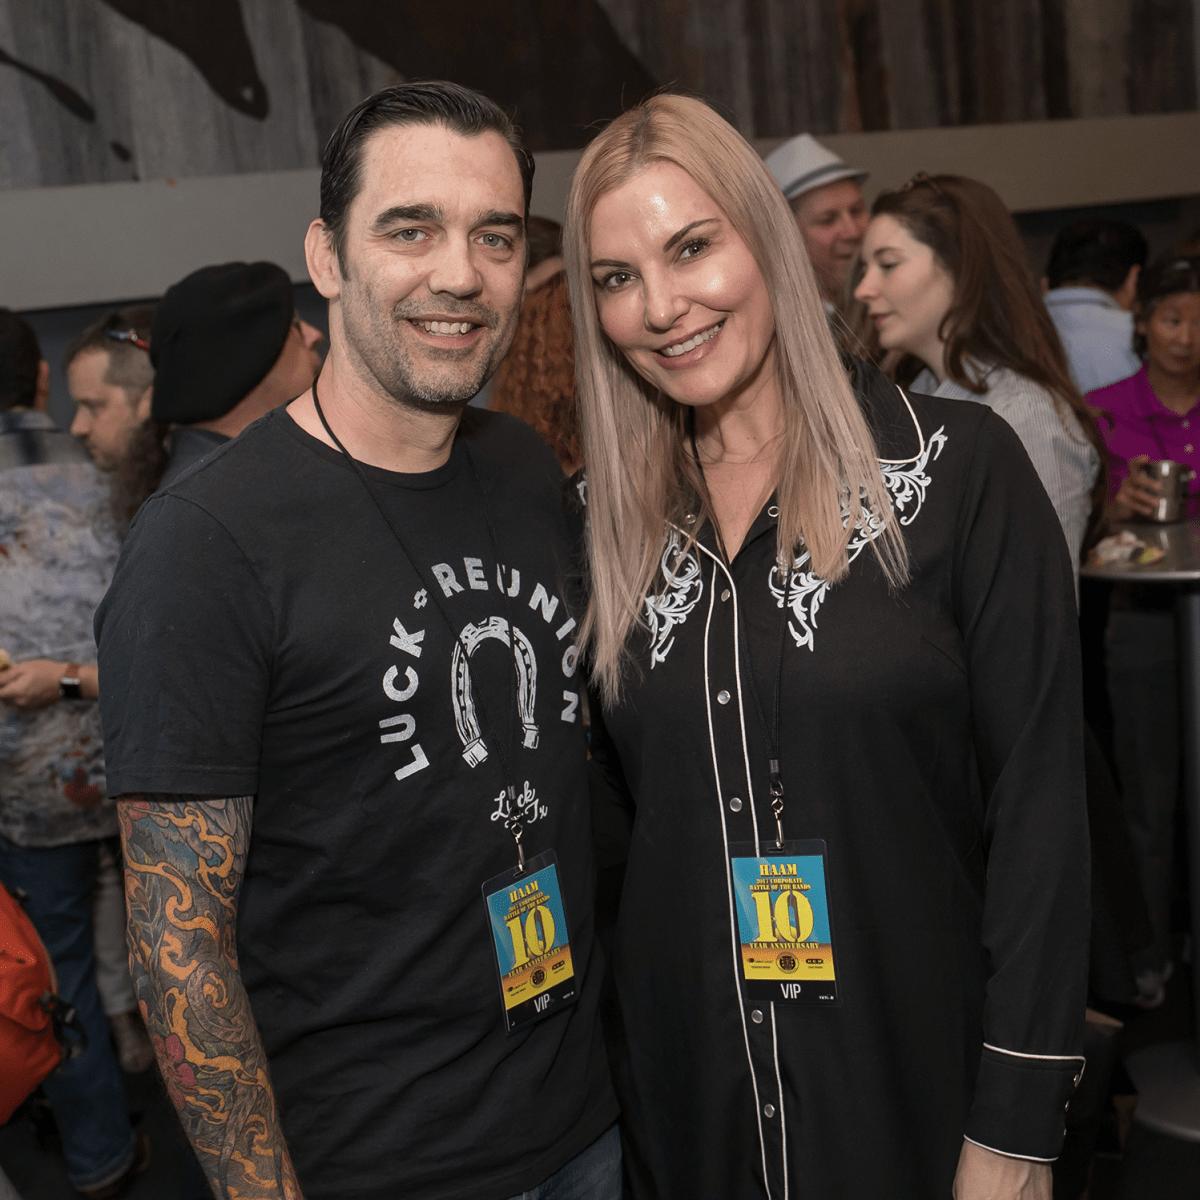 HAAM Corporate Battle of the Bands 2017 Stone Slade Kristin Gunn